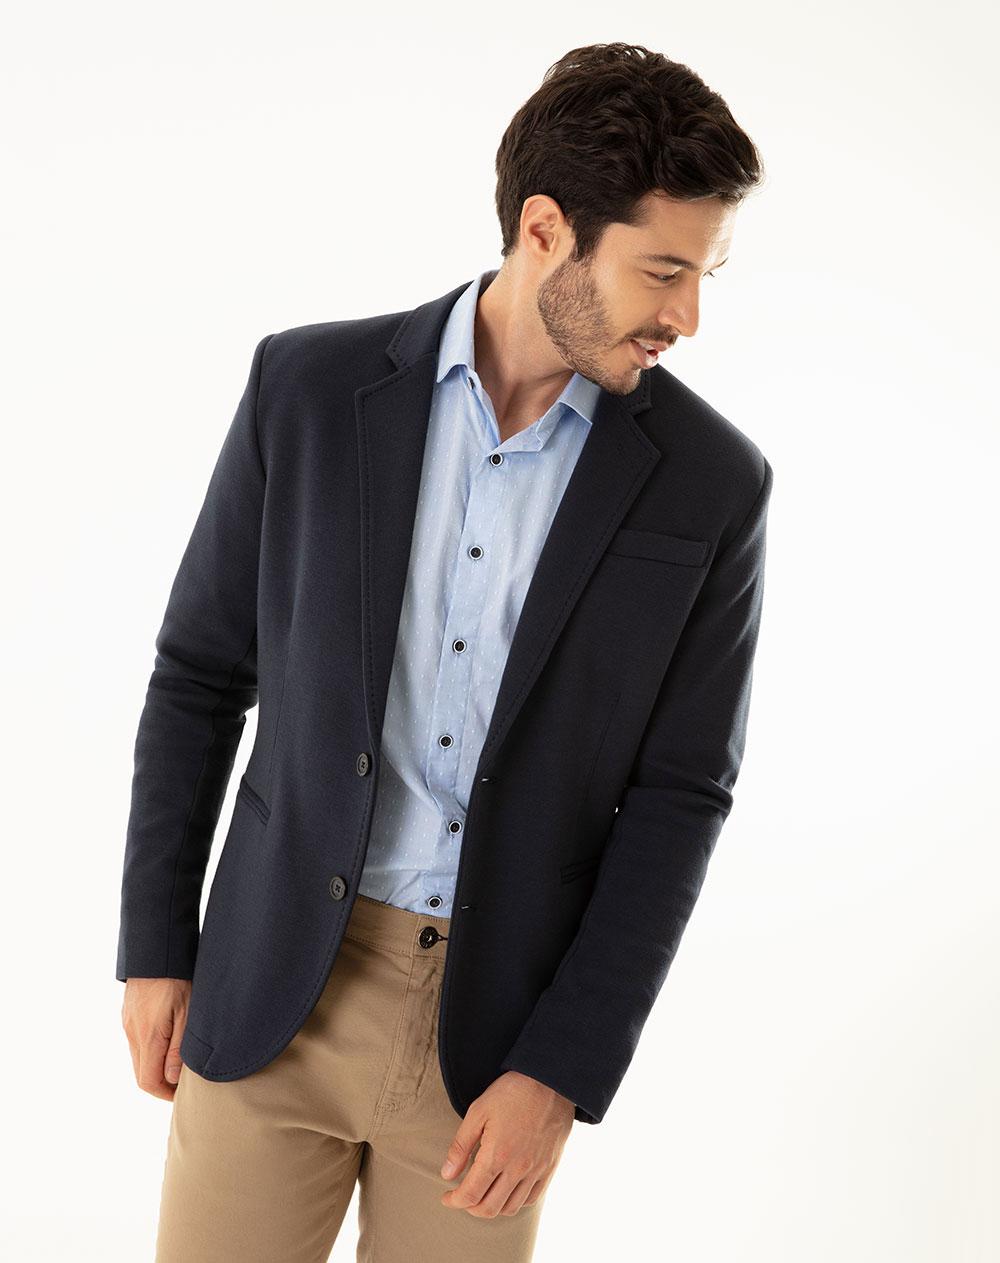 Chaqueta para Hombre Modu Azul Oscura Gef